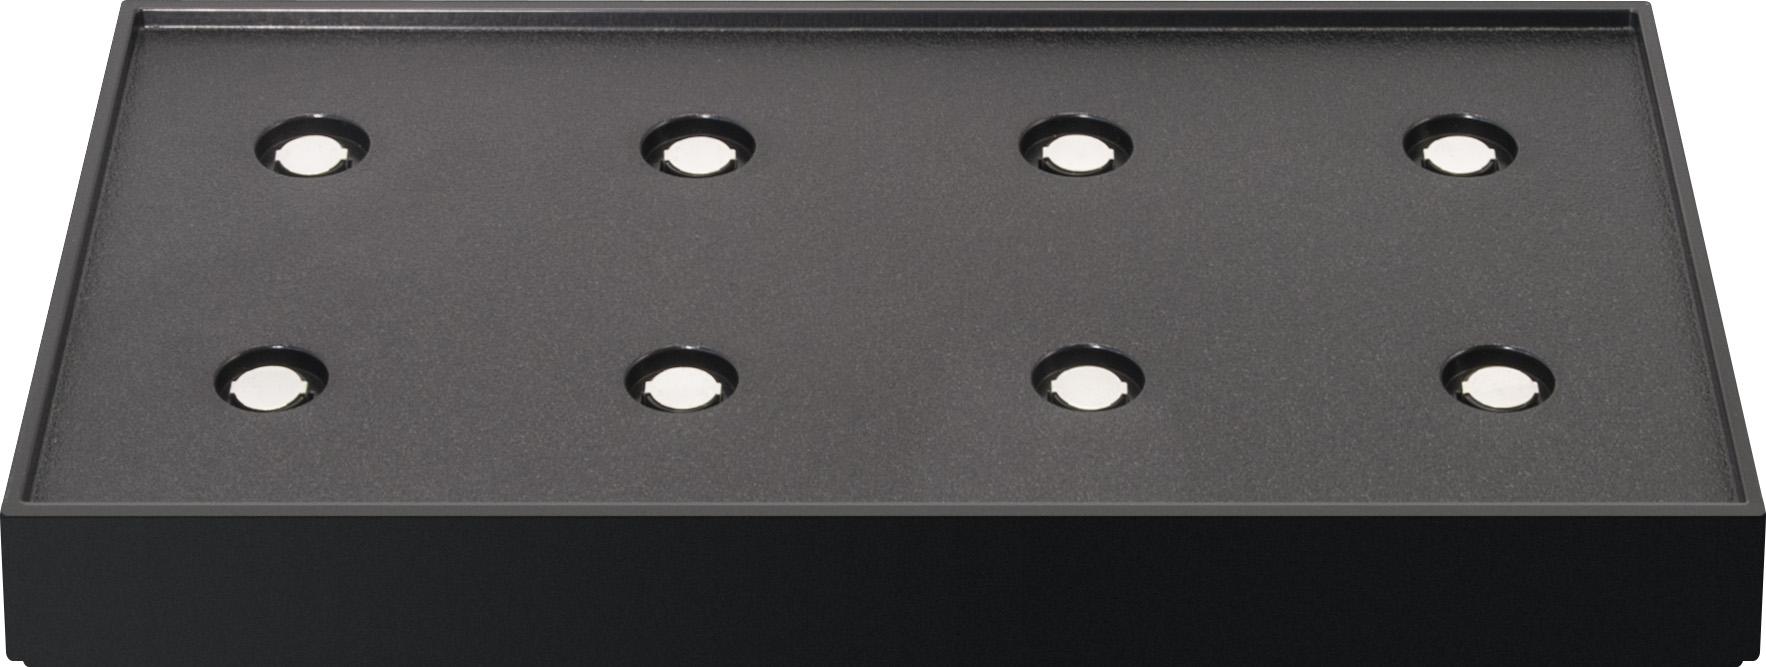 Uhrenbeweger Boxy Grundplatte